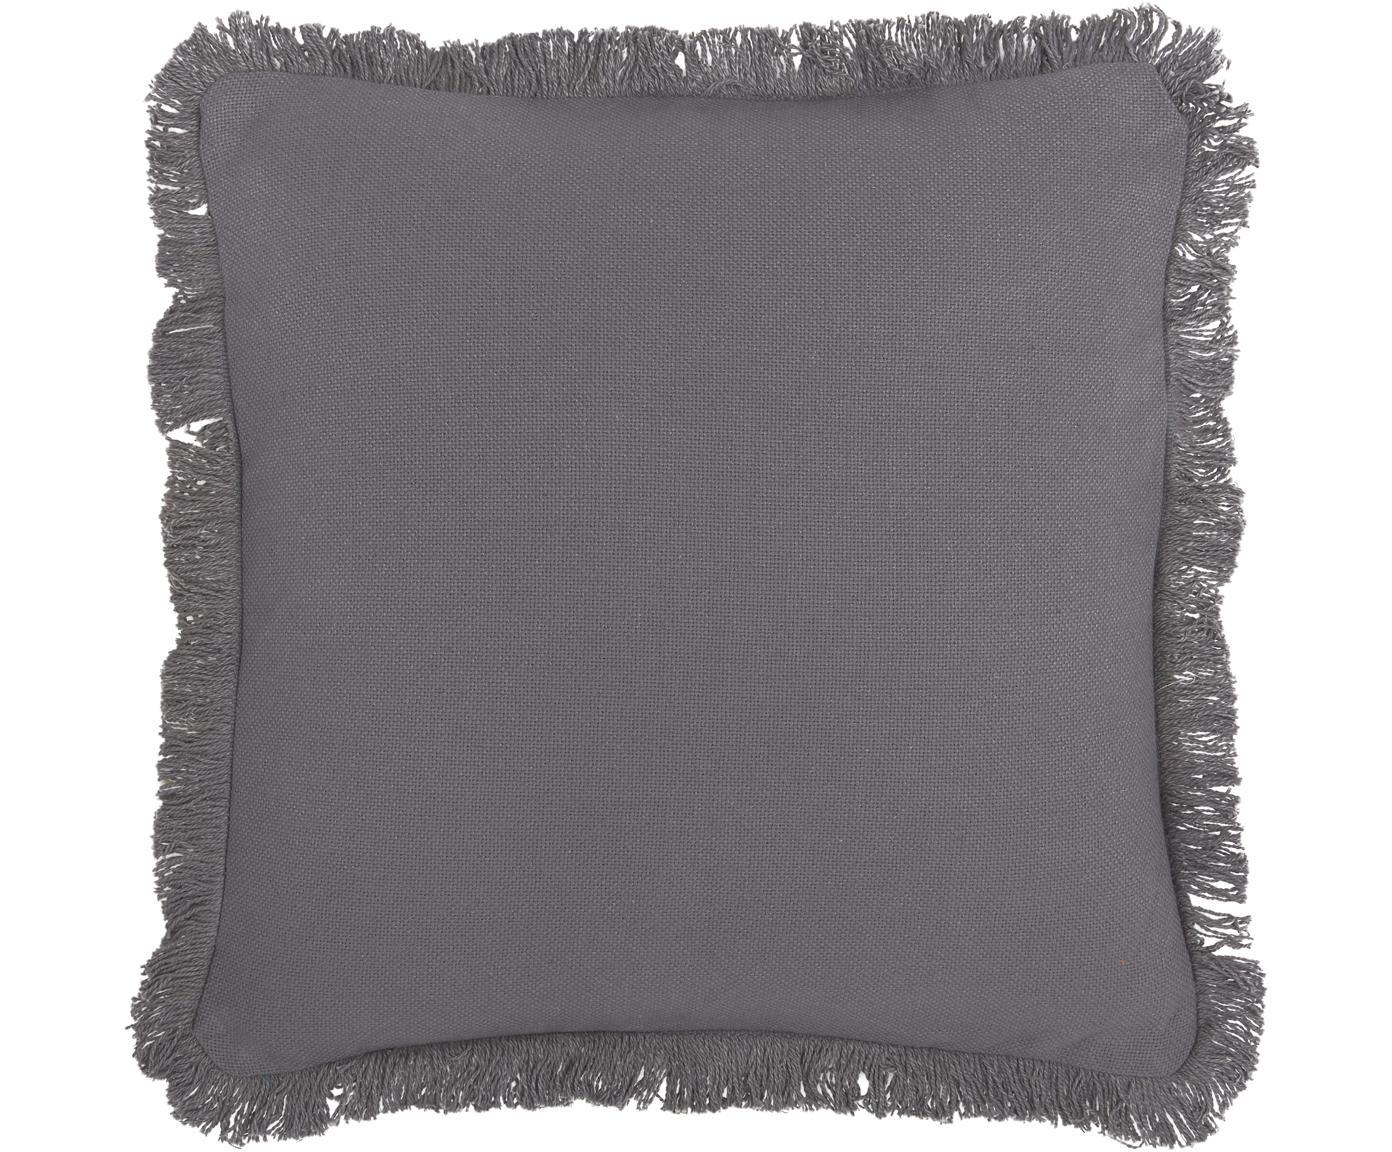 Cuscino con frange e imbottitura Prague, Retro: cotone, Antracite, Larg. 40 x Lung. 40 cm